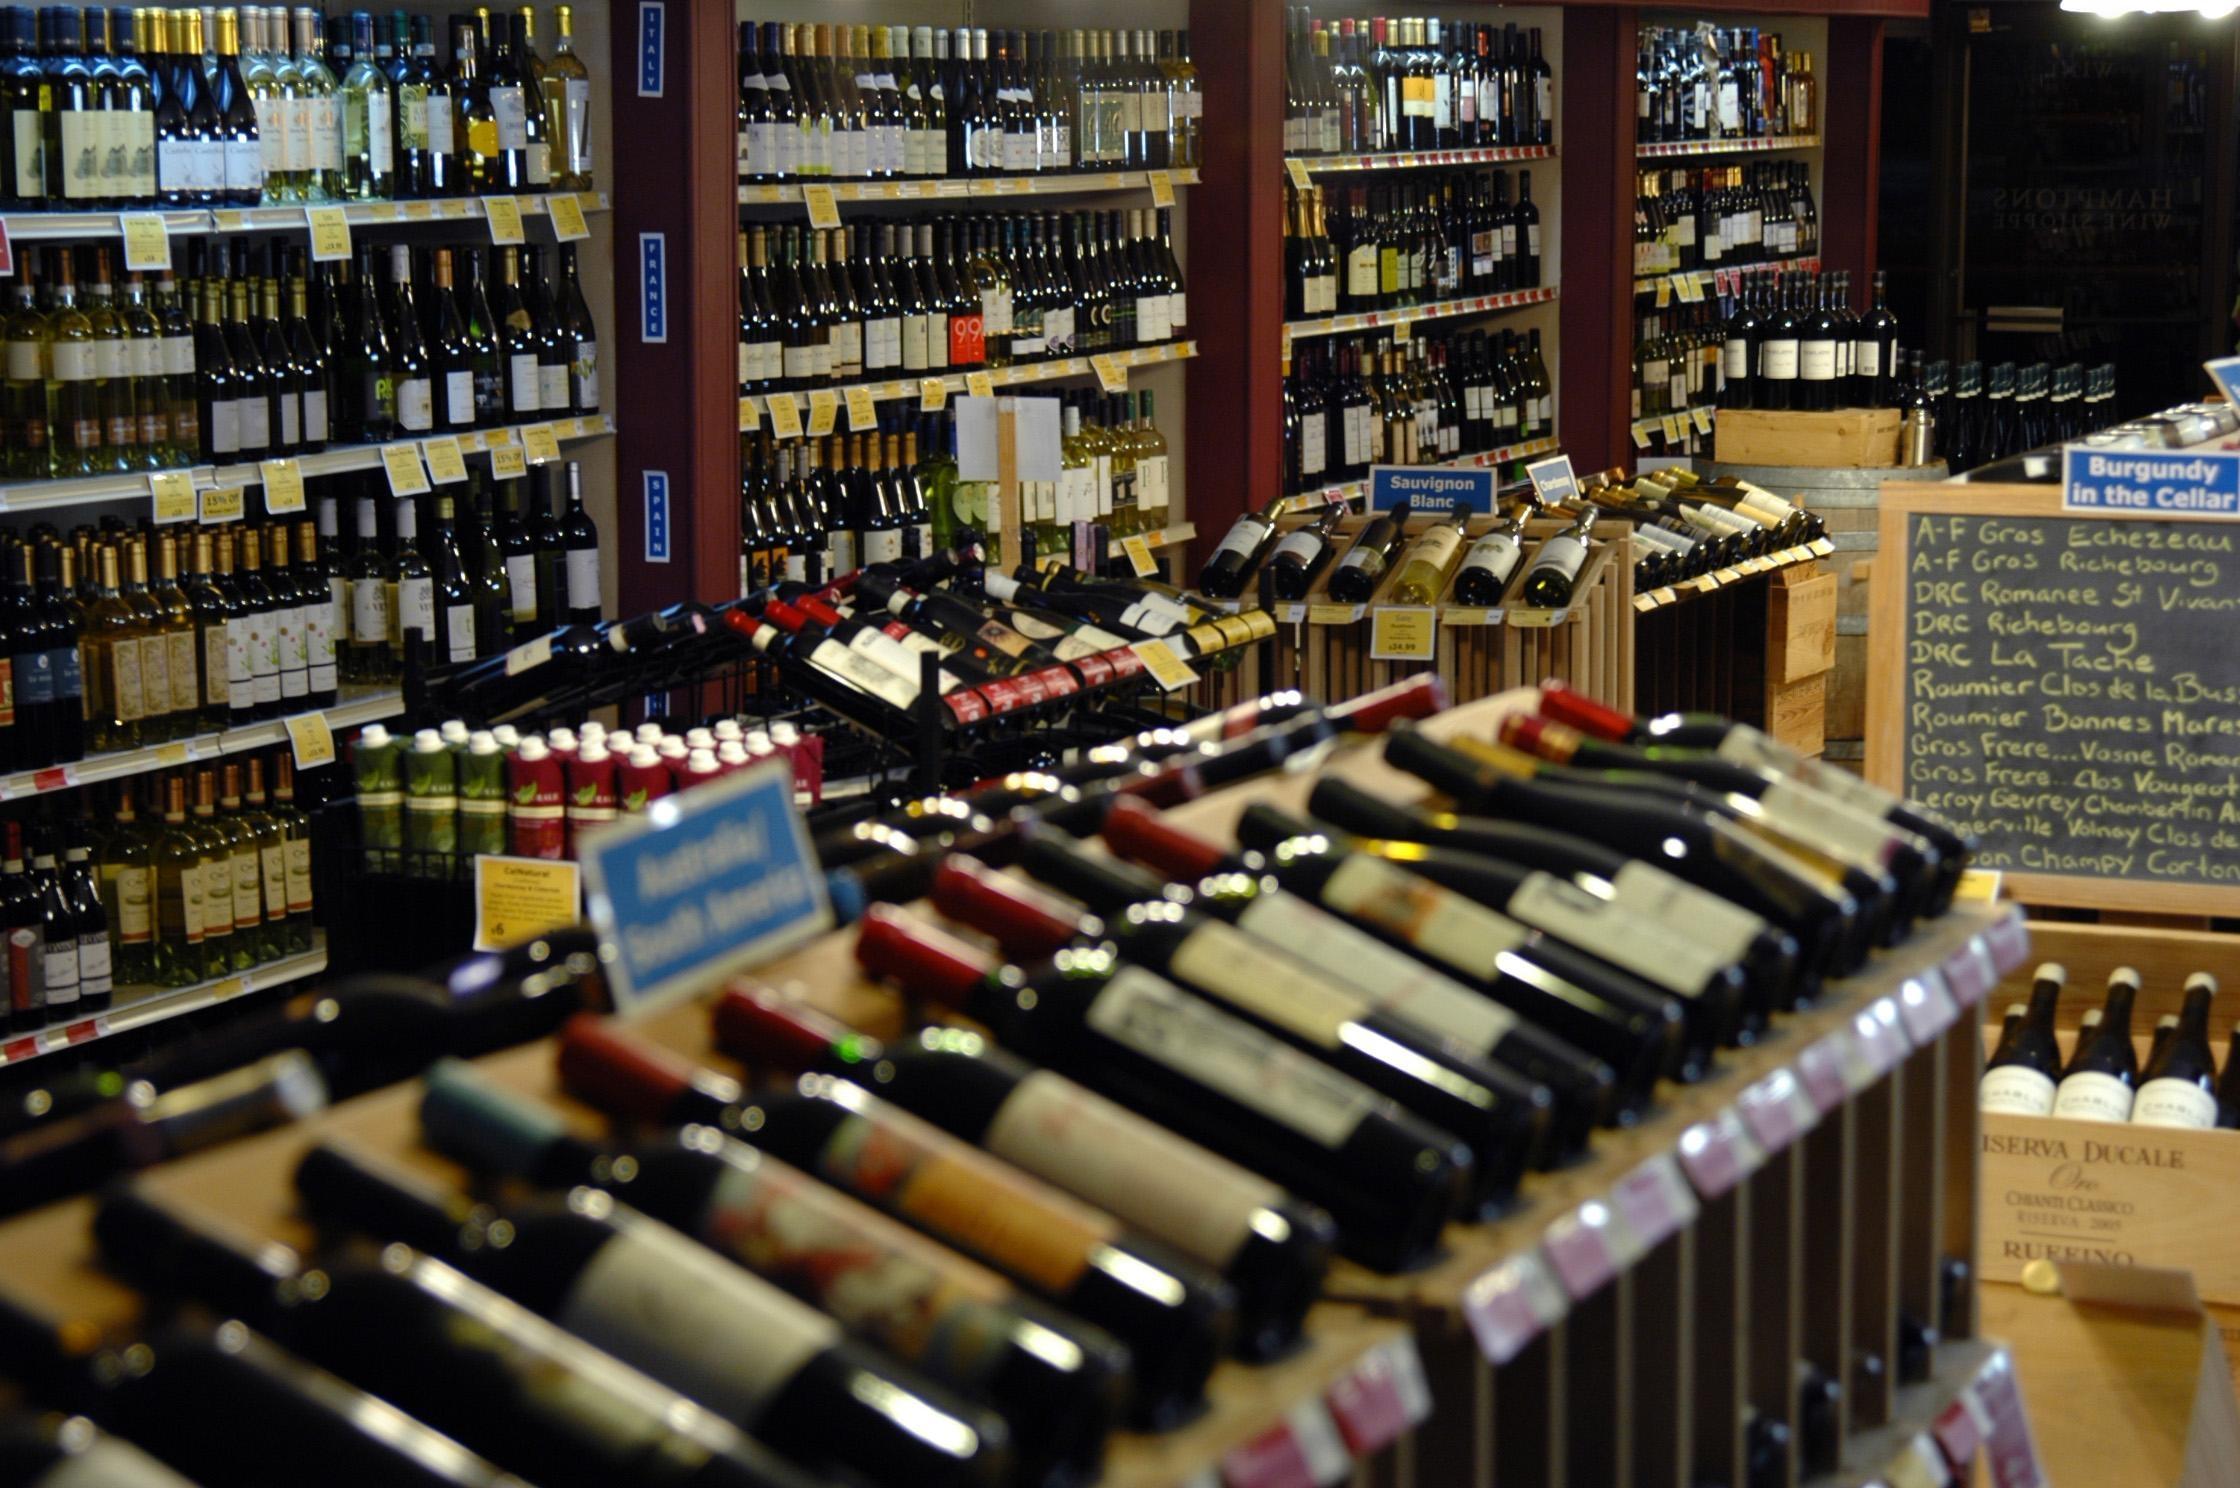 Hamptons Wine Shoppe image 3